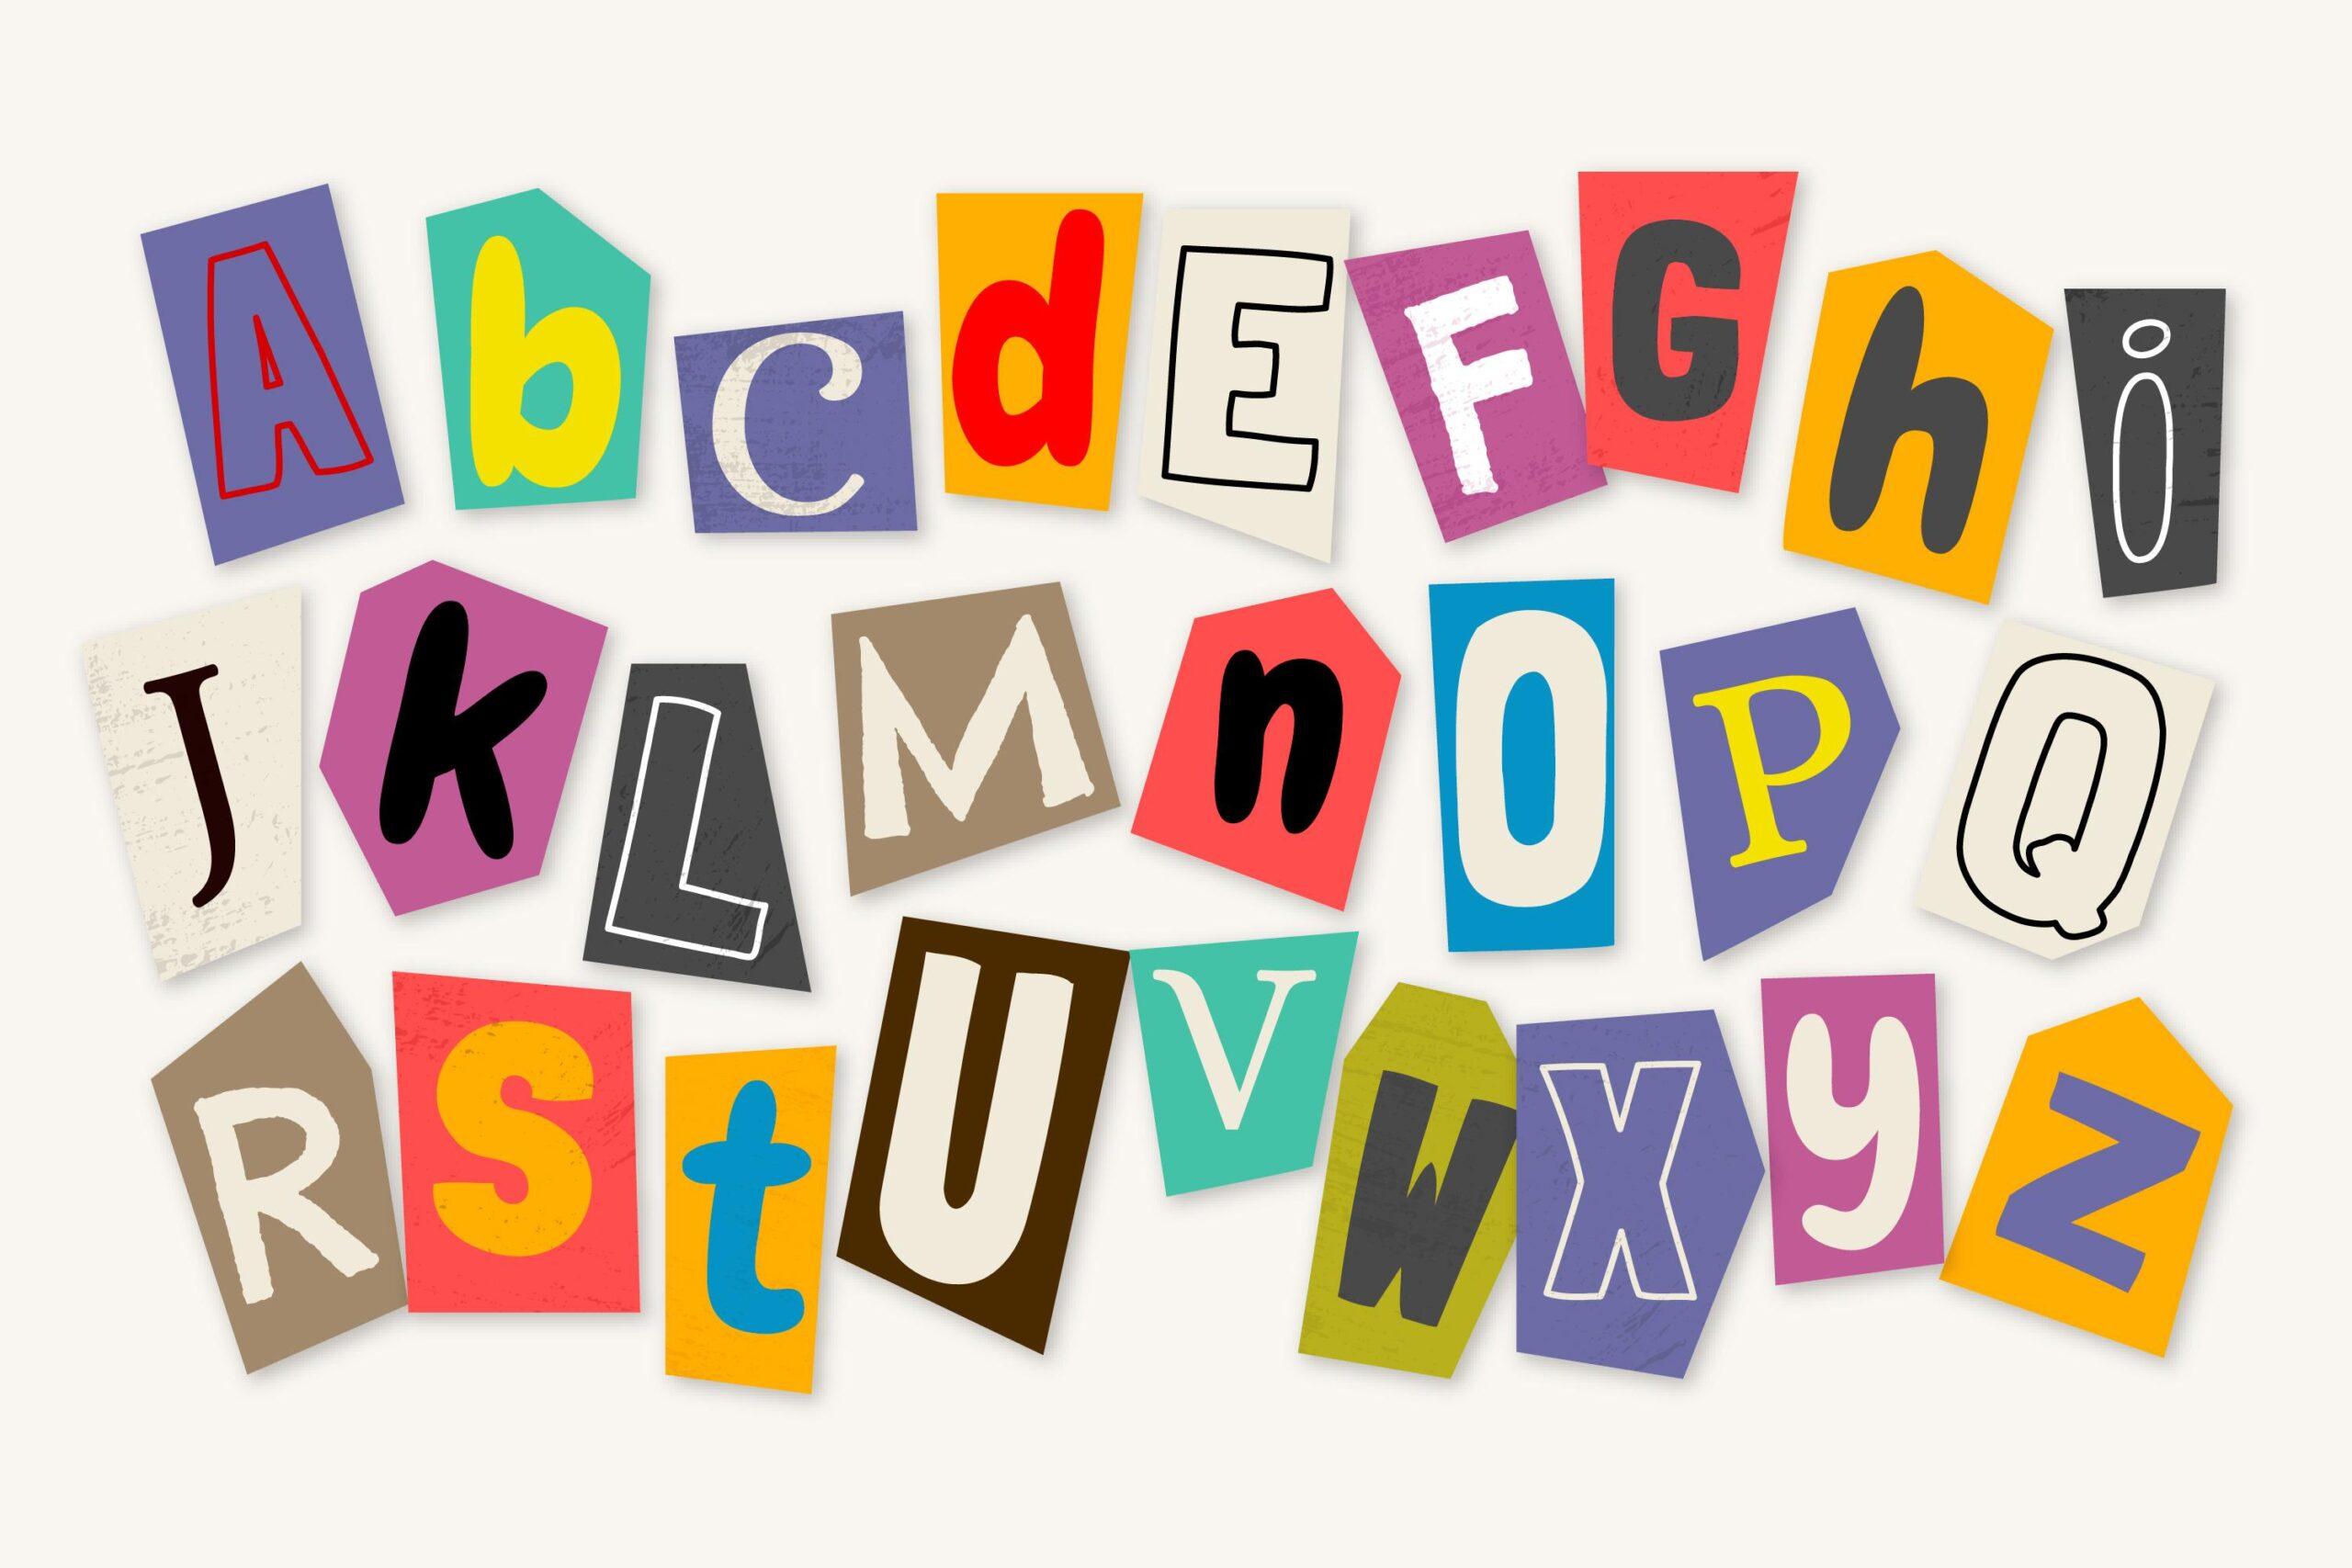 The alphabet A through Z